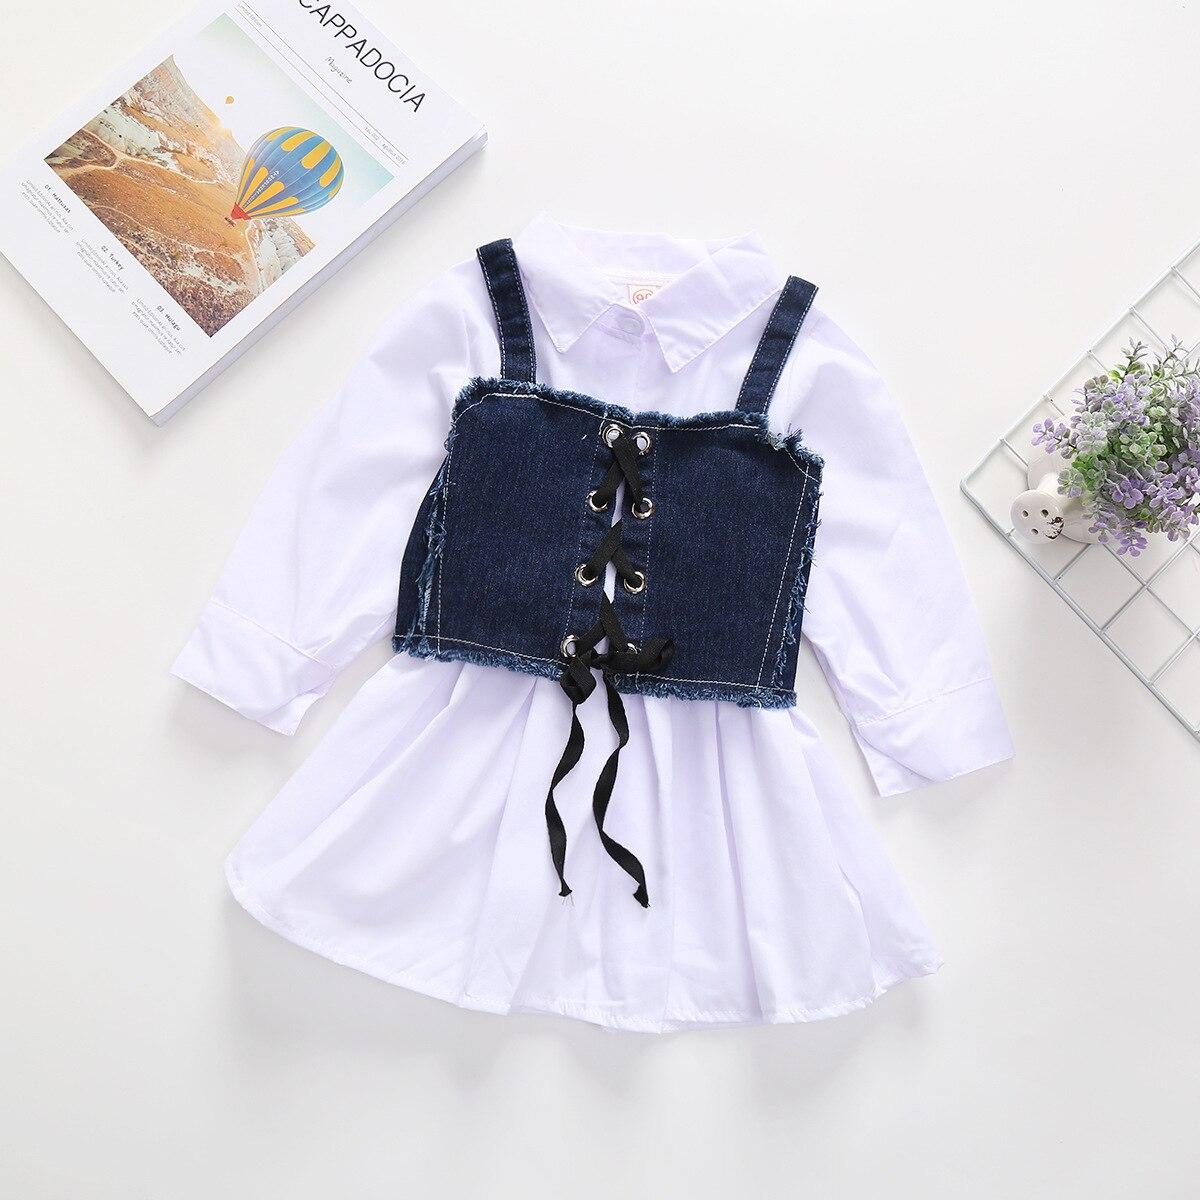 Girls Solid Color Fold-down Collar Long-Sleeve Shirt Dress L3.31 5